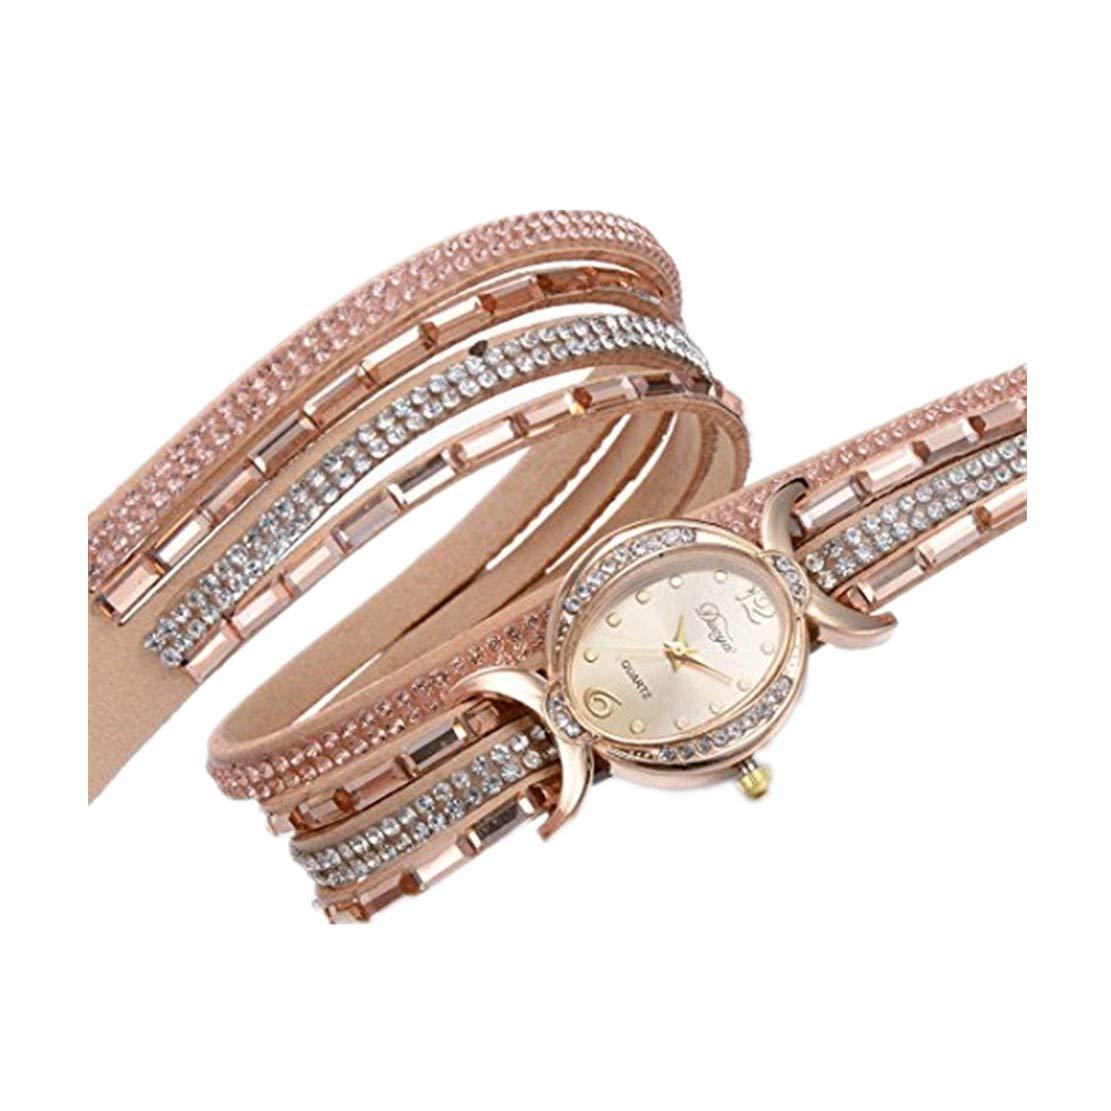 Uhren-erthome-Damen-Armband-Diamant-Kreis-Uhr-Student-Mode-Table-Muttertag-Geschenk